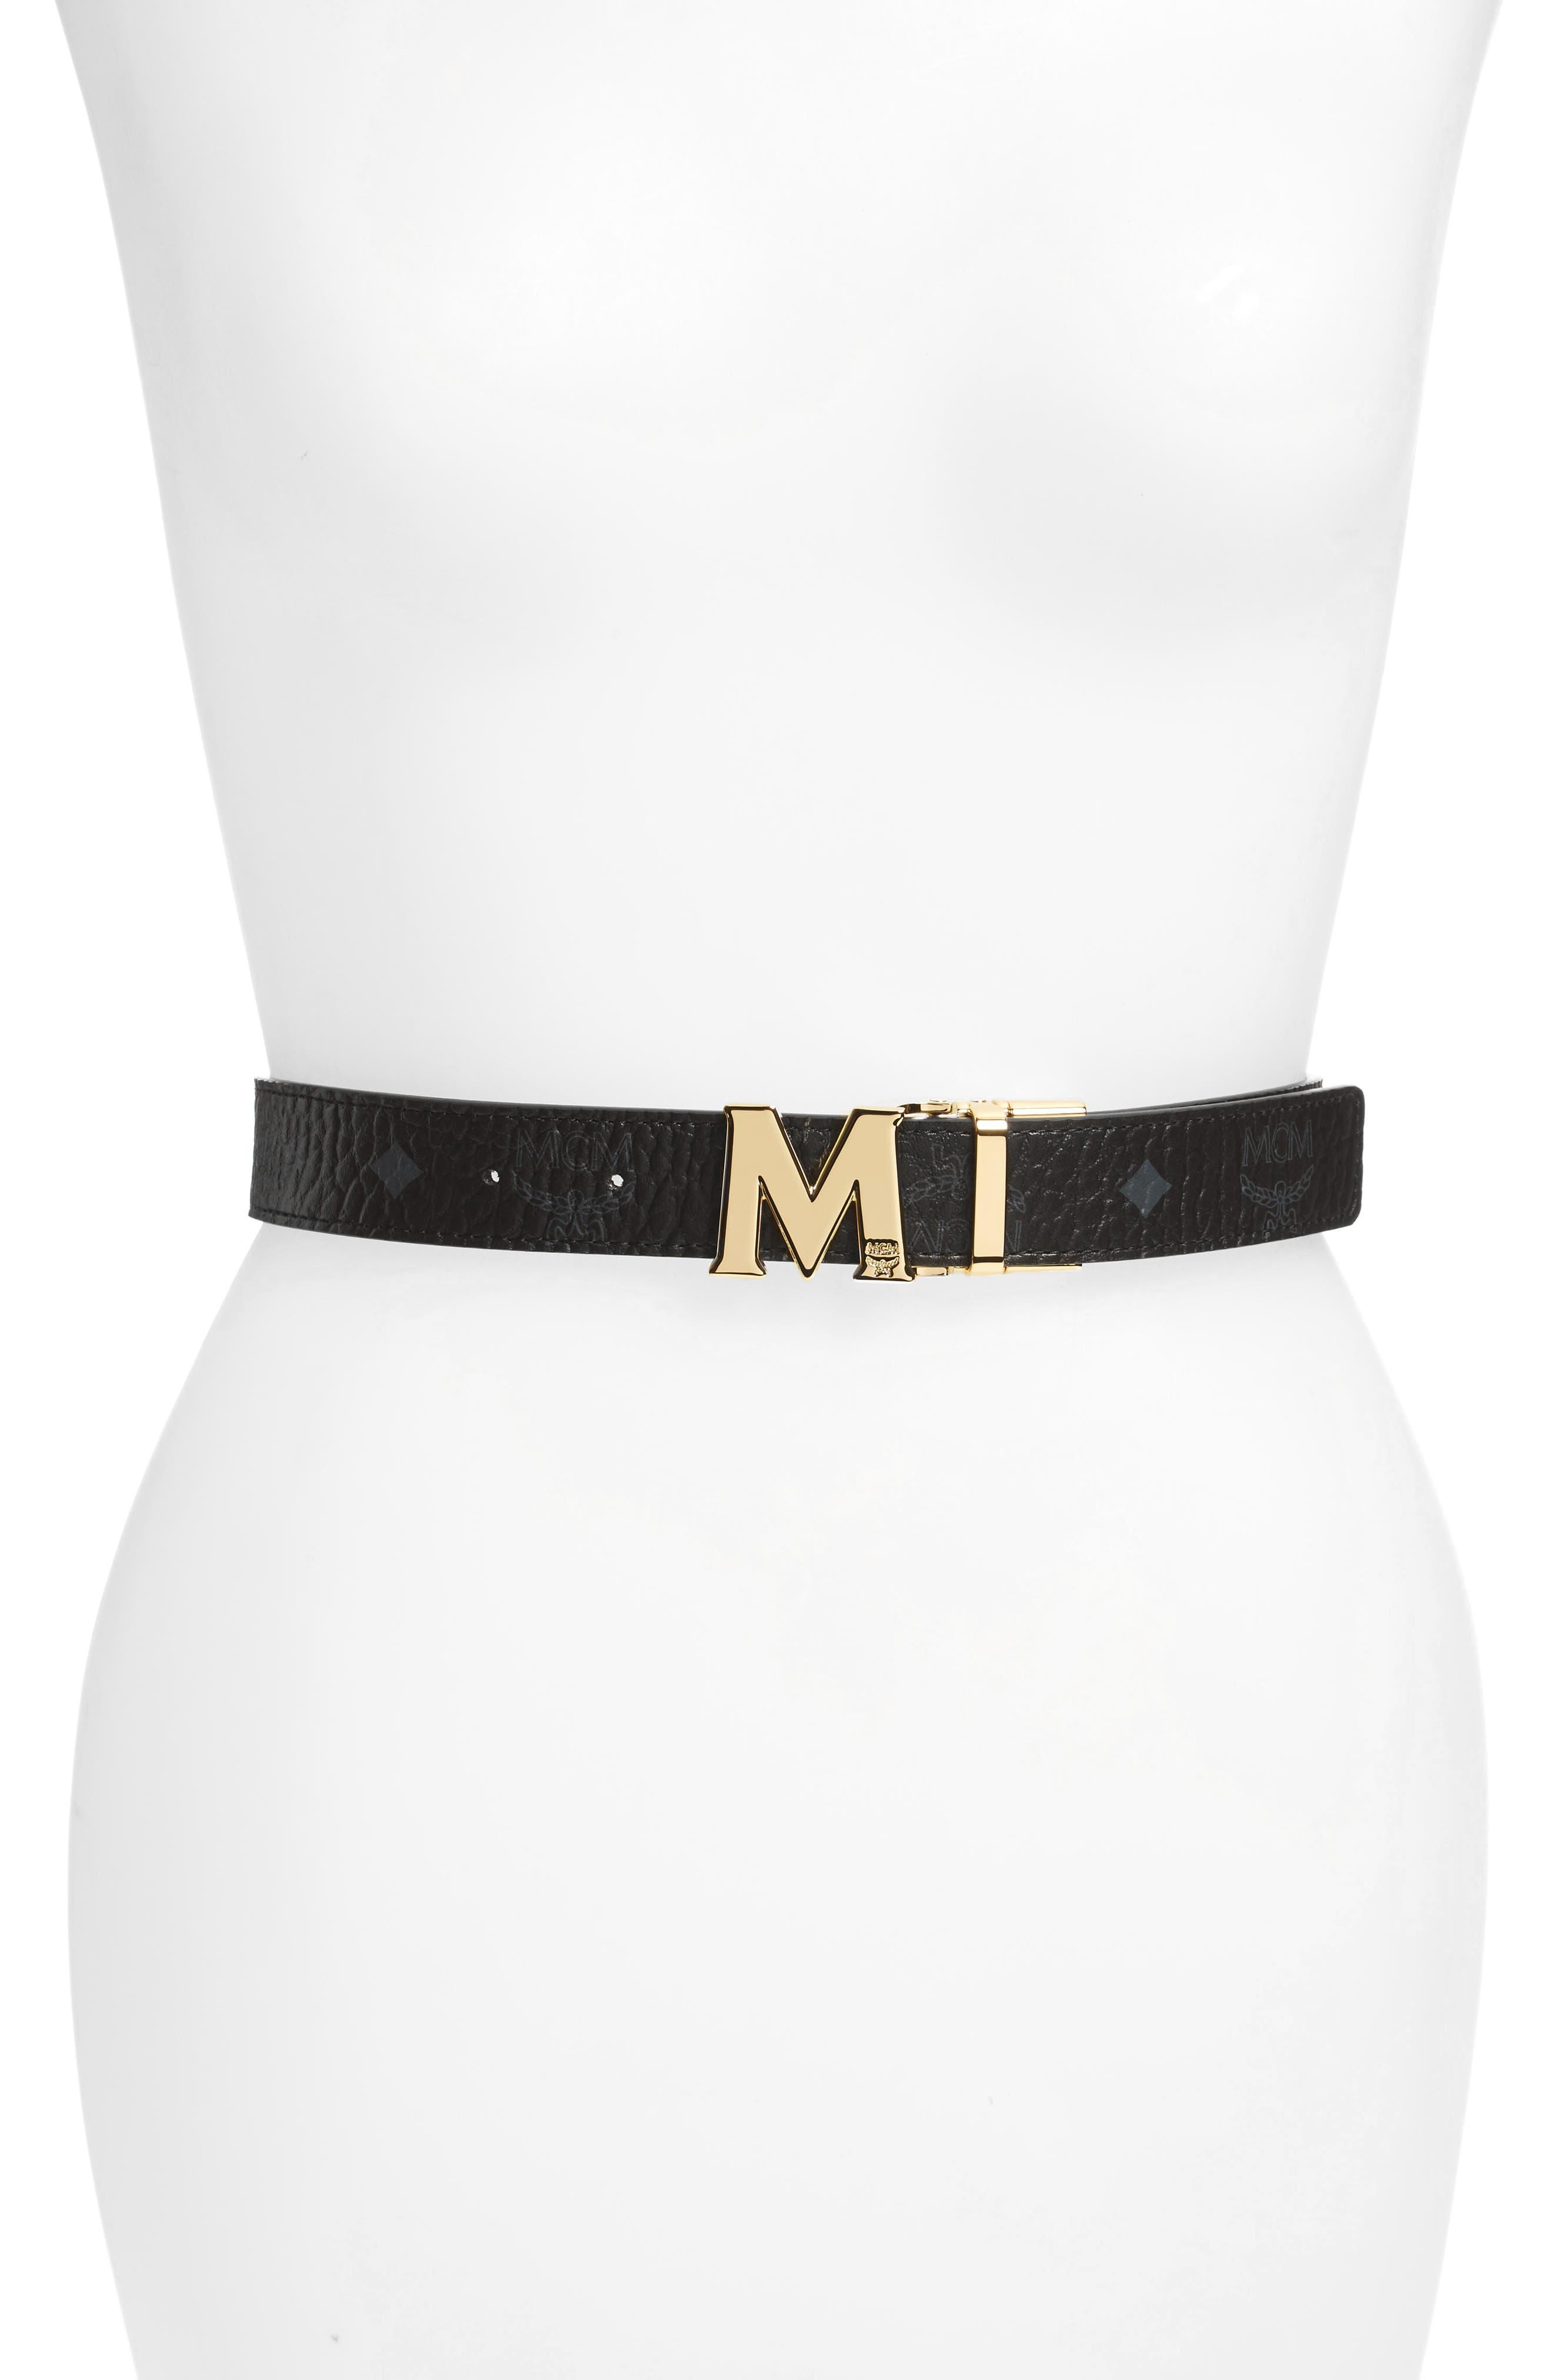 Mcm Visetos Reversible Leather Belt, Size One Size - Black / Black (W/ Gold)